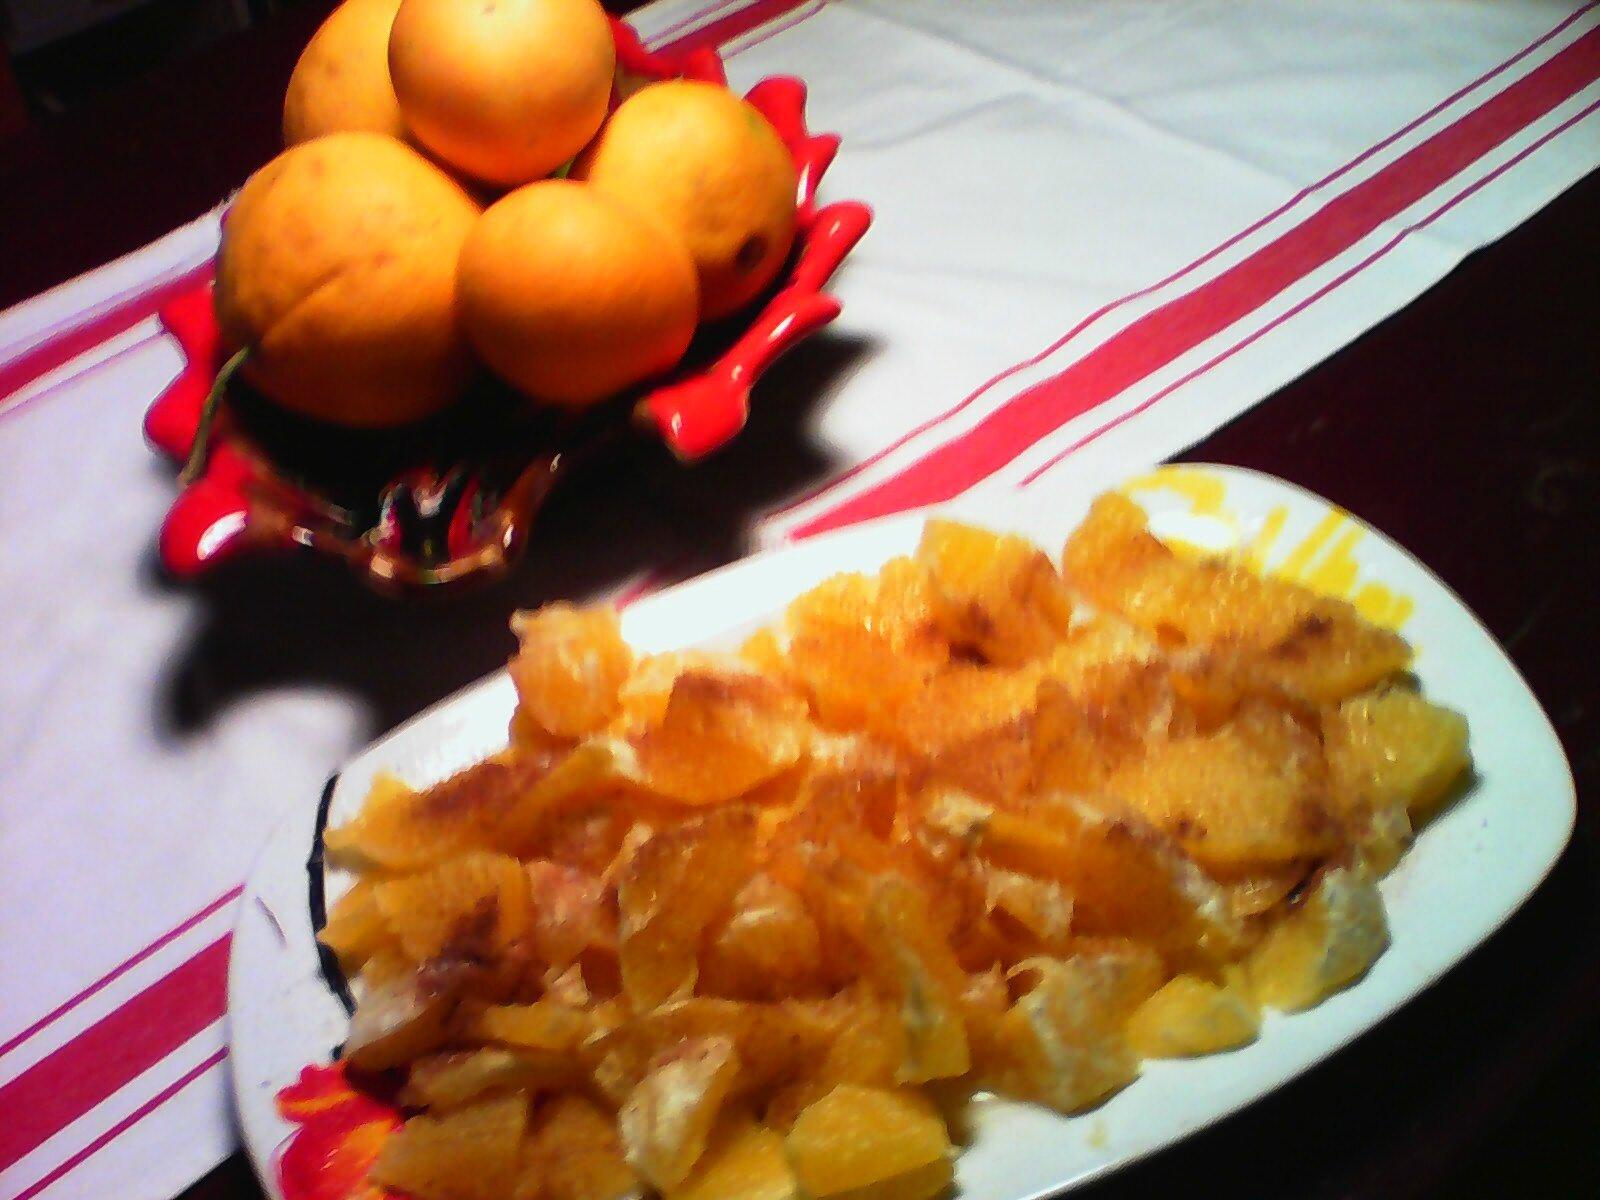 Les Mercredis gourmands à l'orange.